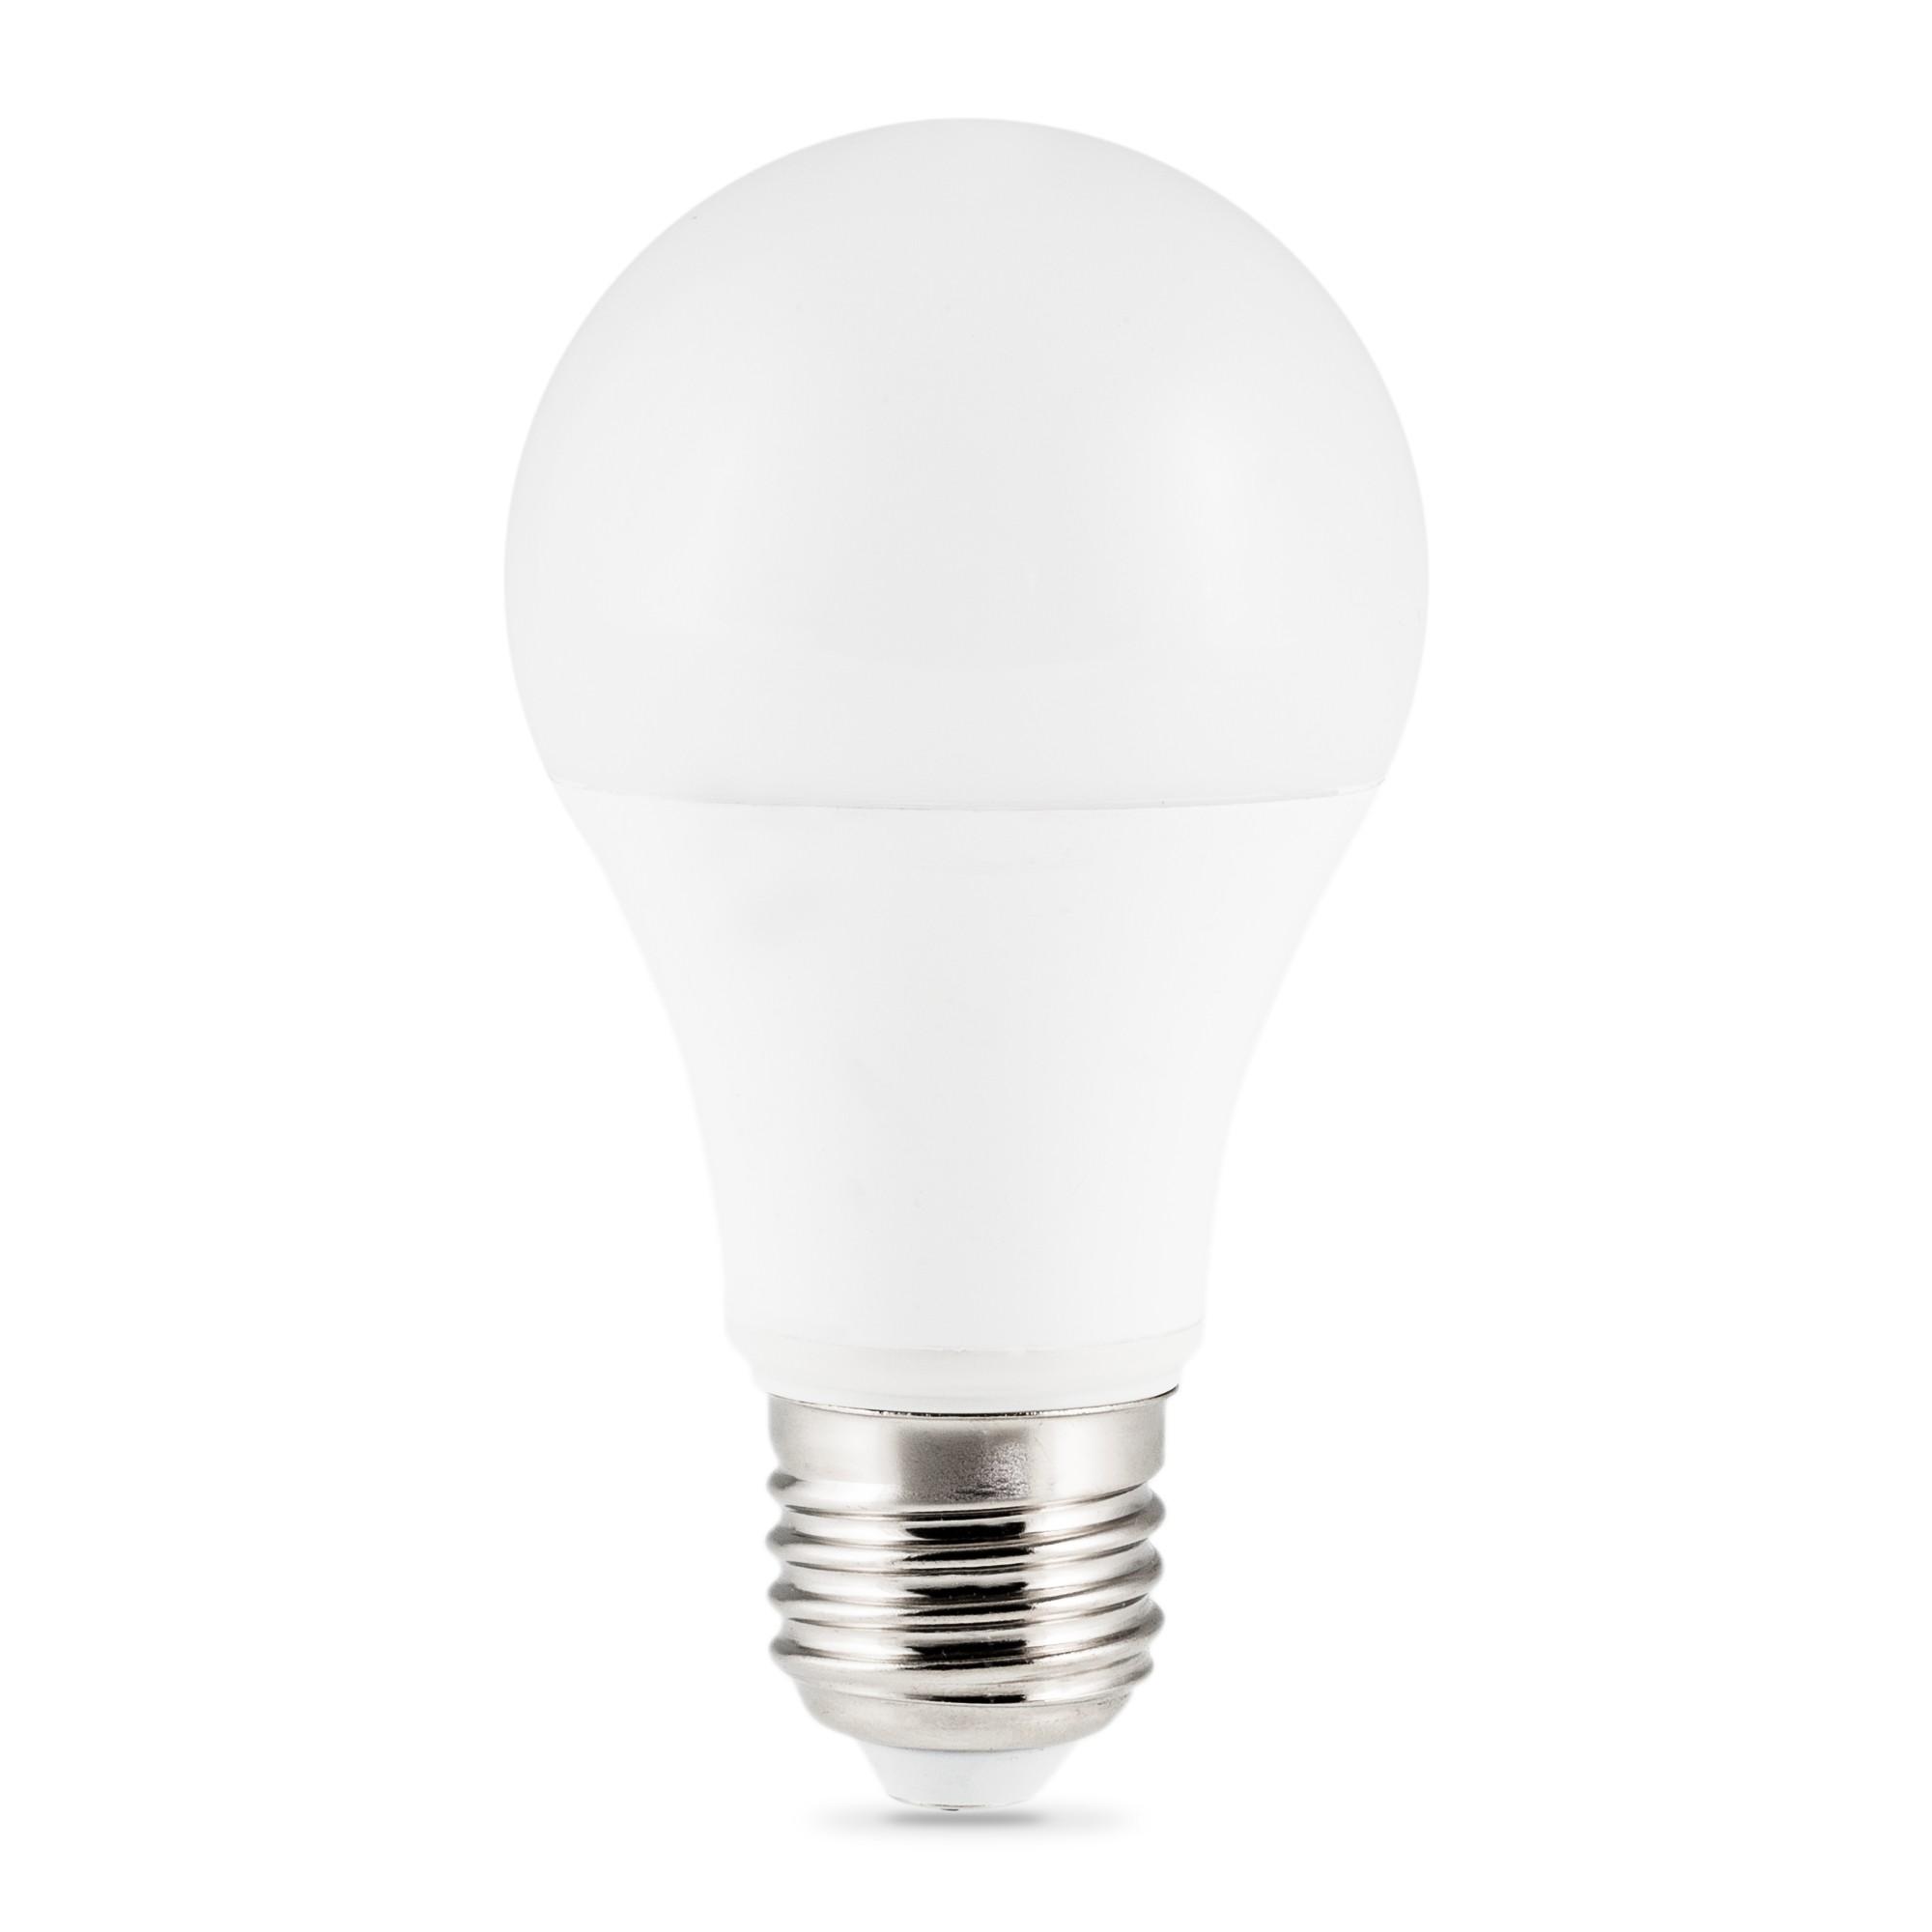 E27-3COLOR-10W---20 Schöne Led Lampen E27 60 Watt Dekorationen